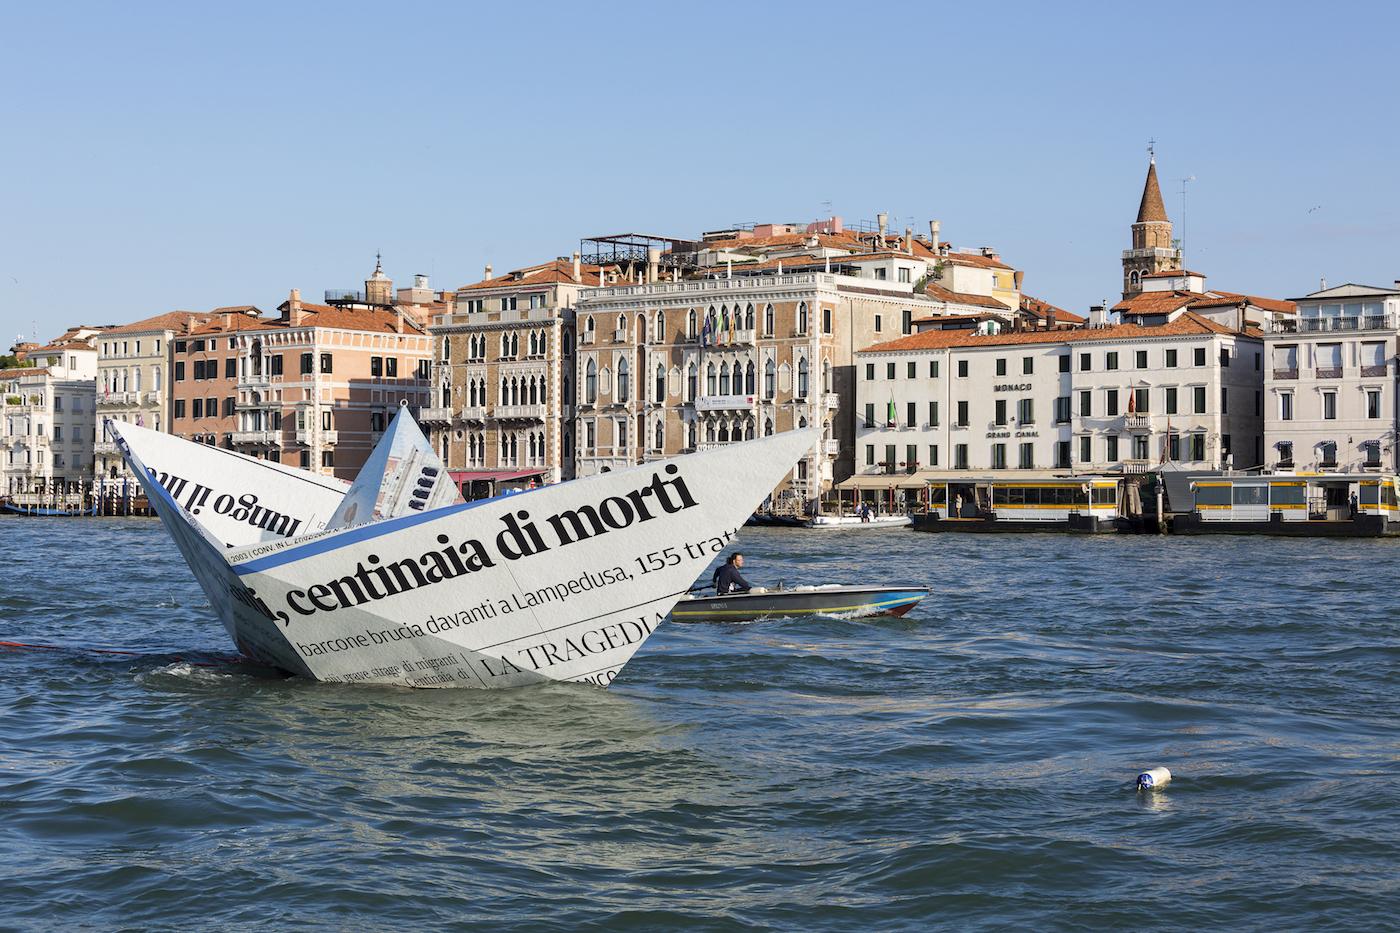 'Radical Seafaring' at the Parrish Art Museum